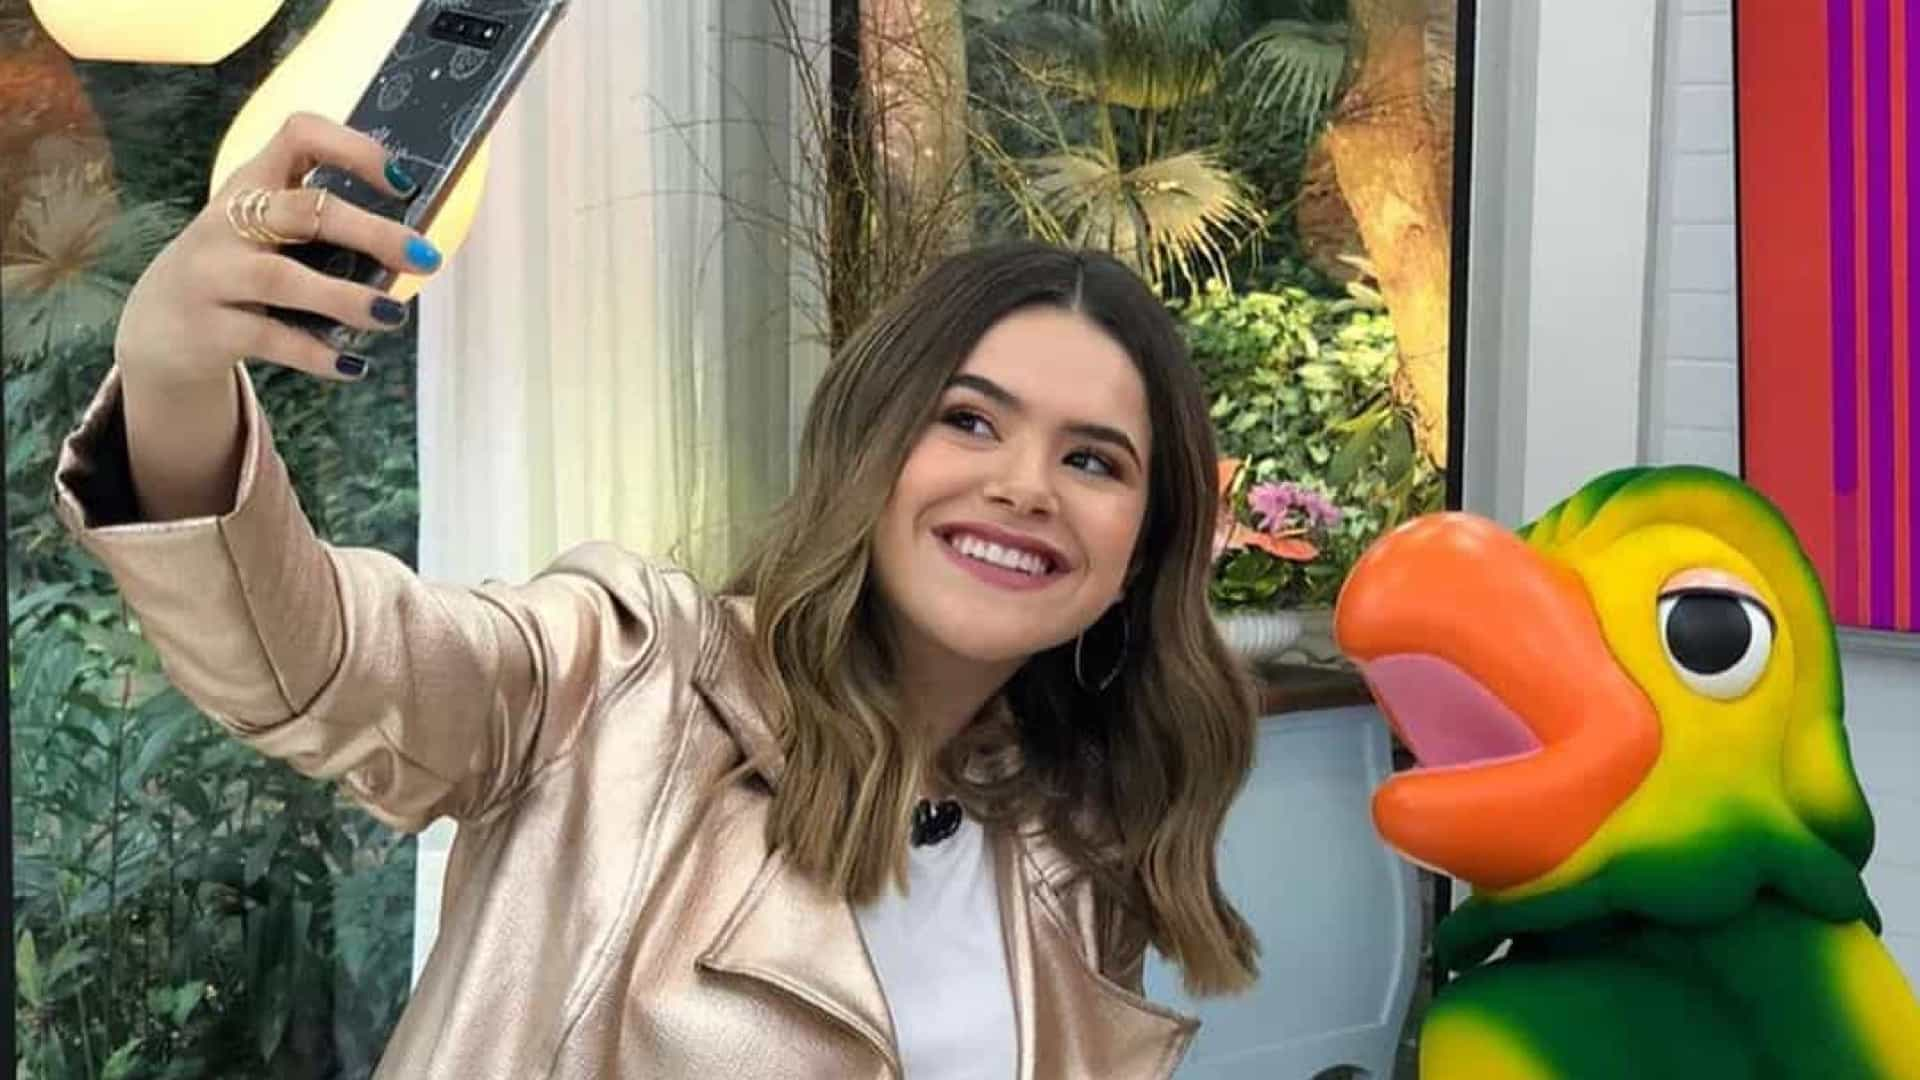 Maisa do SBT participa de programa da Globo